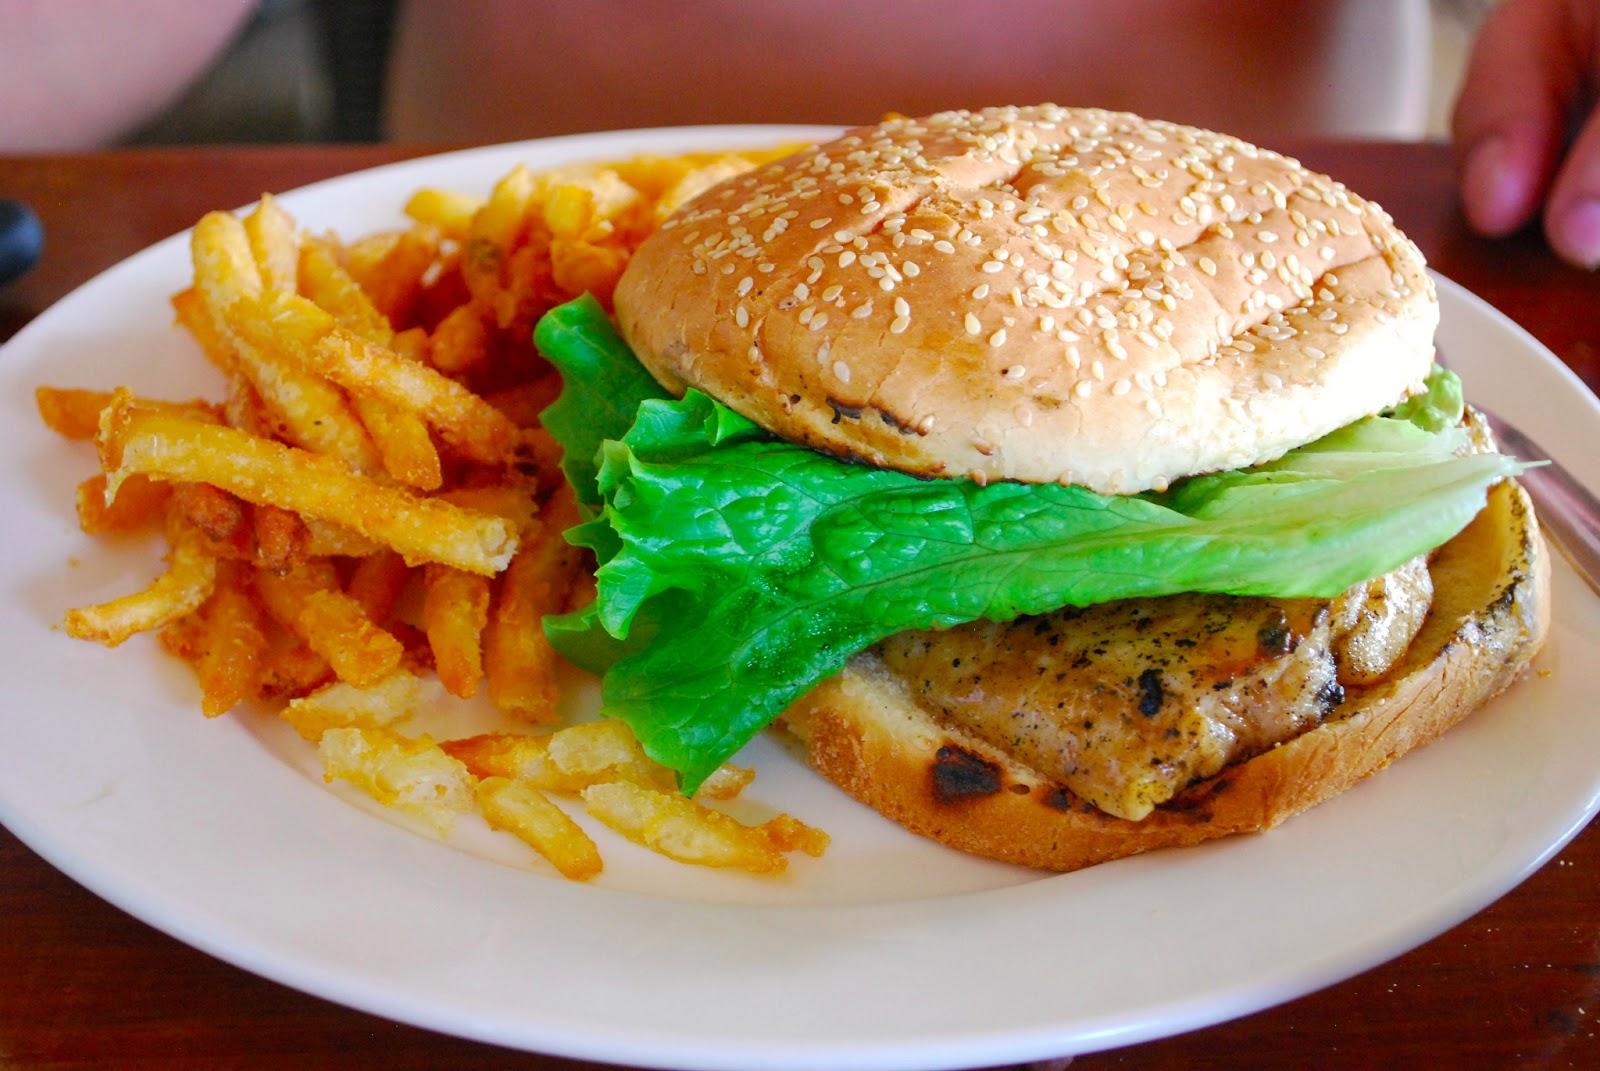 Wanderlust traveler pinel island st martin for Fish burger near me